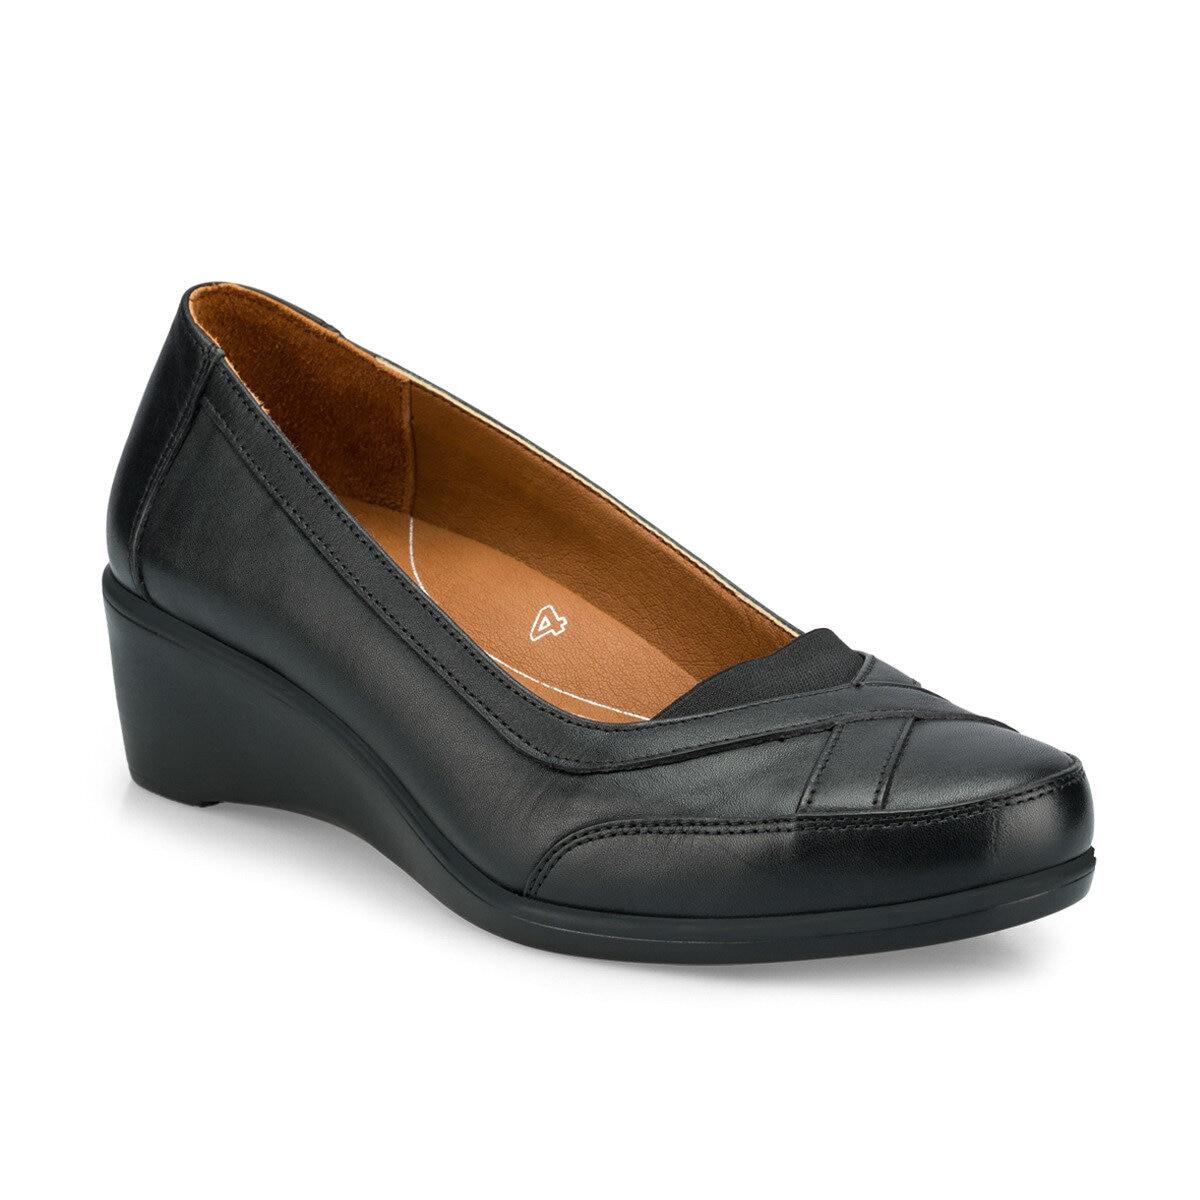 FLO 103013.Z Black Women Shoes Polaris 5 Point